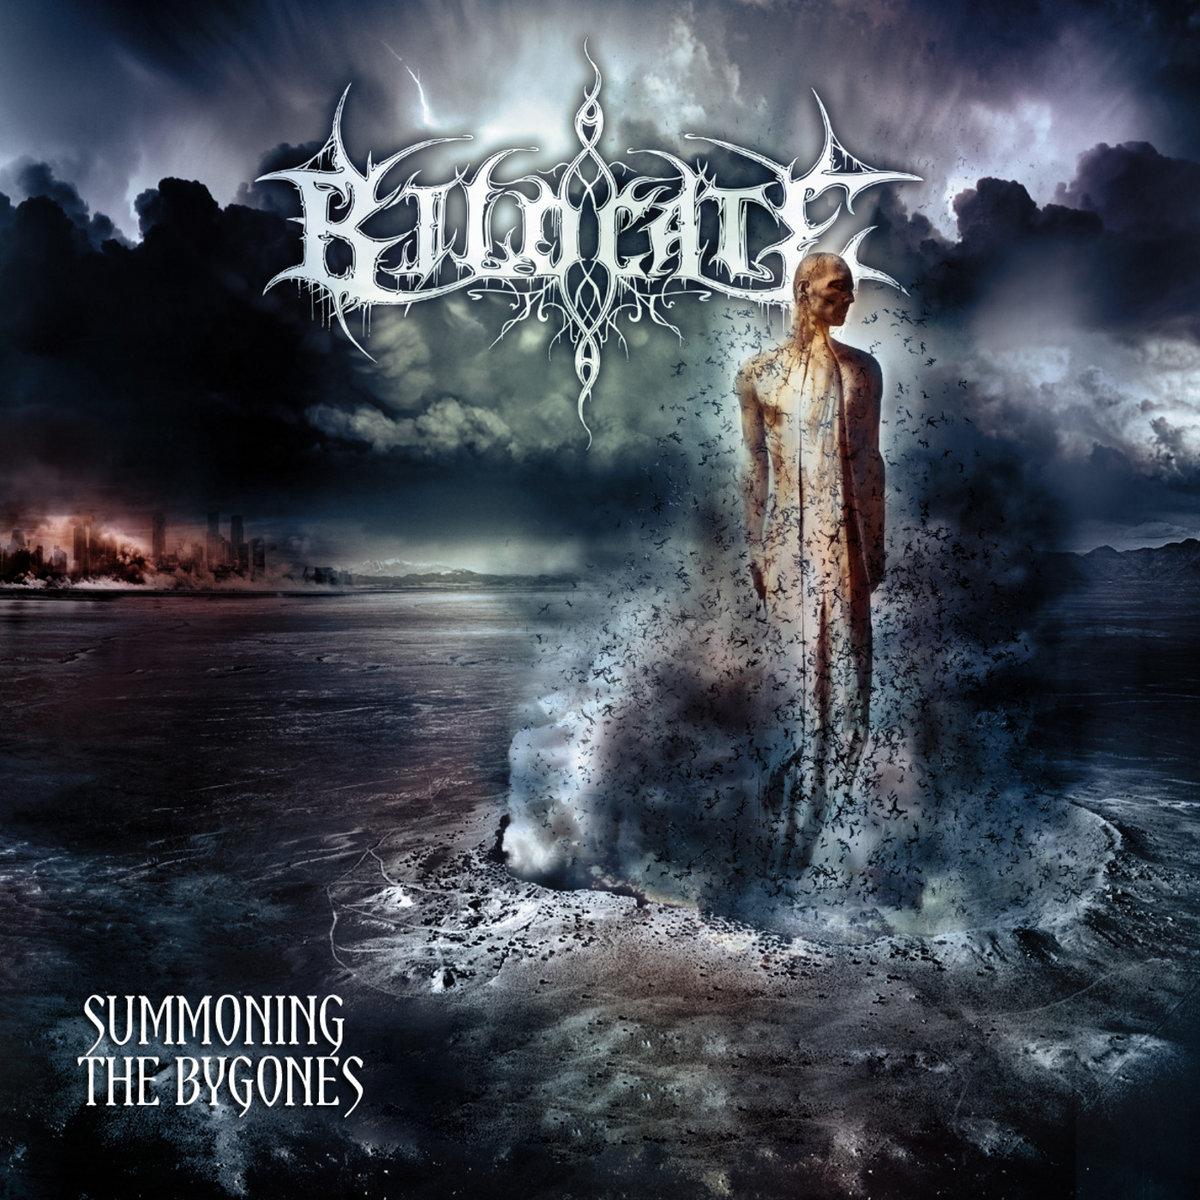 Bilocate - Summoning the Bygones (2012)